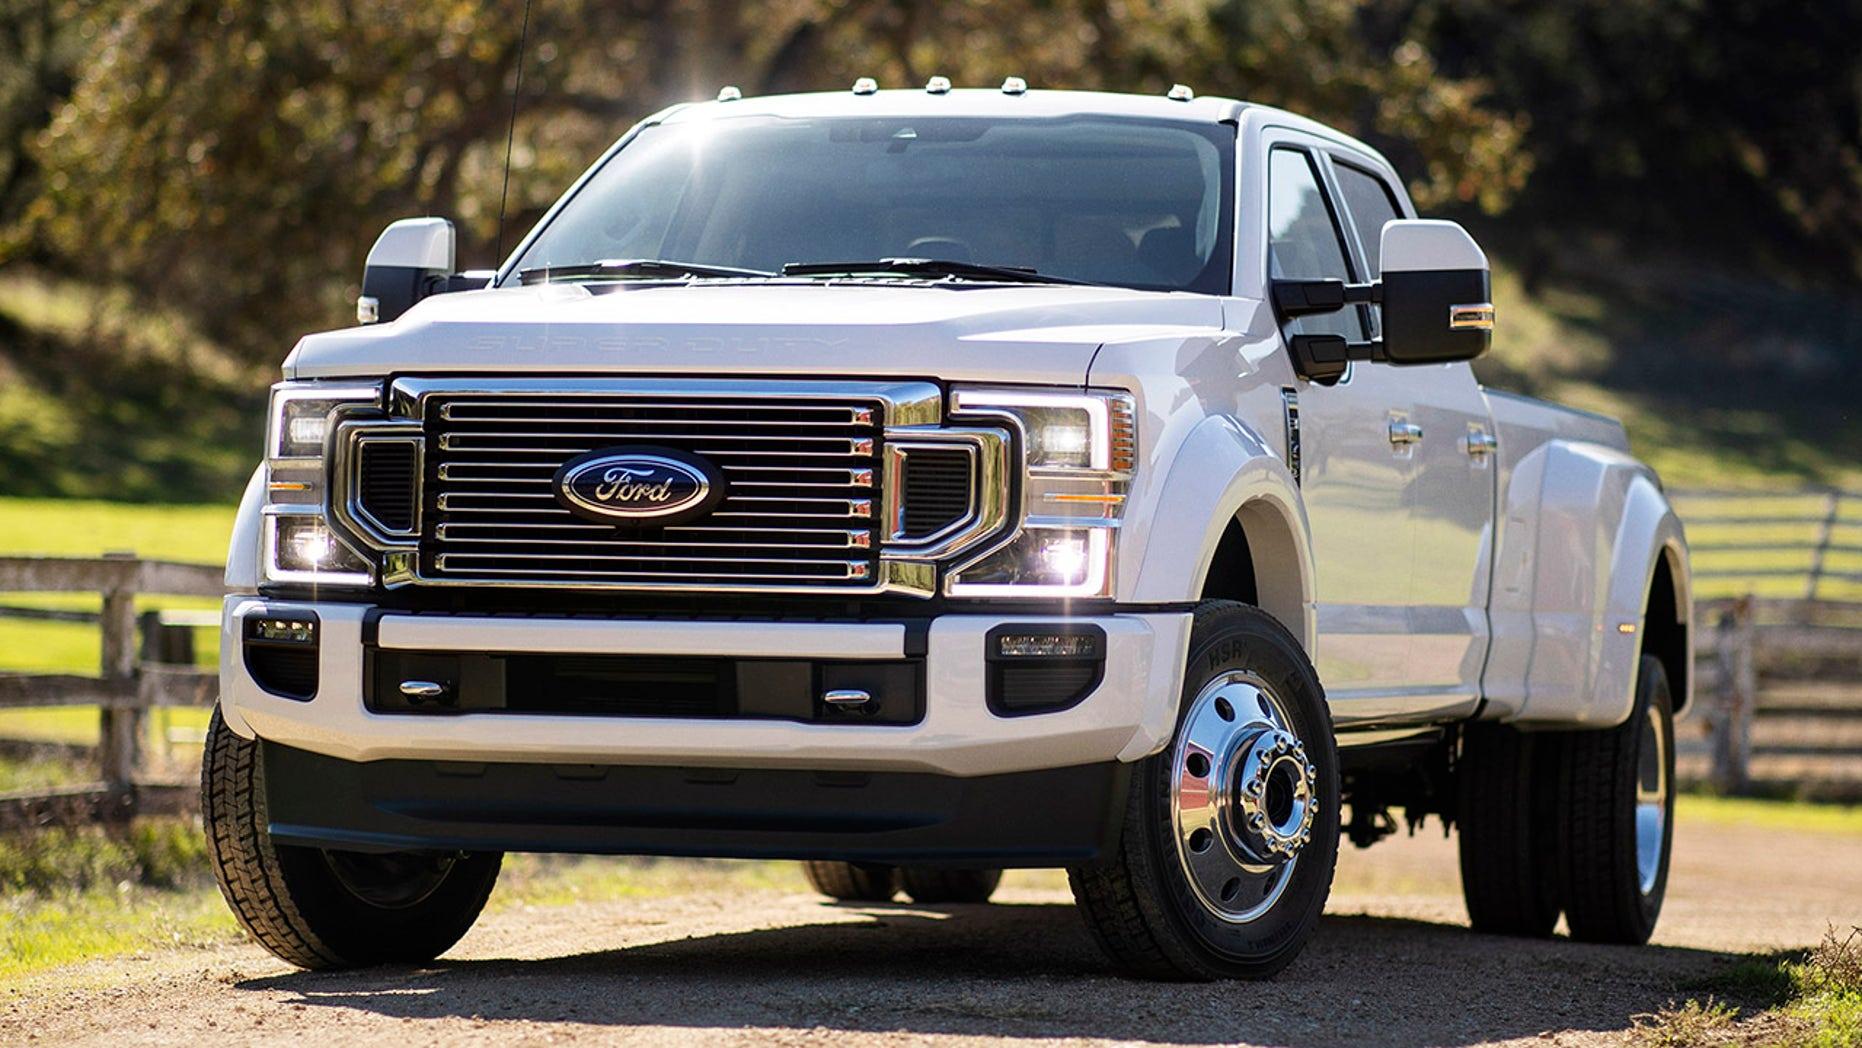 2020 Ford F-Series Super Duty 450